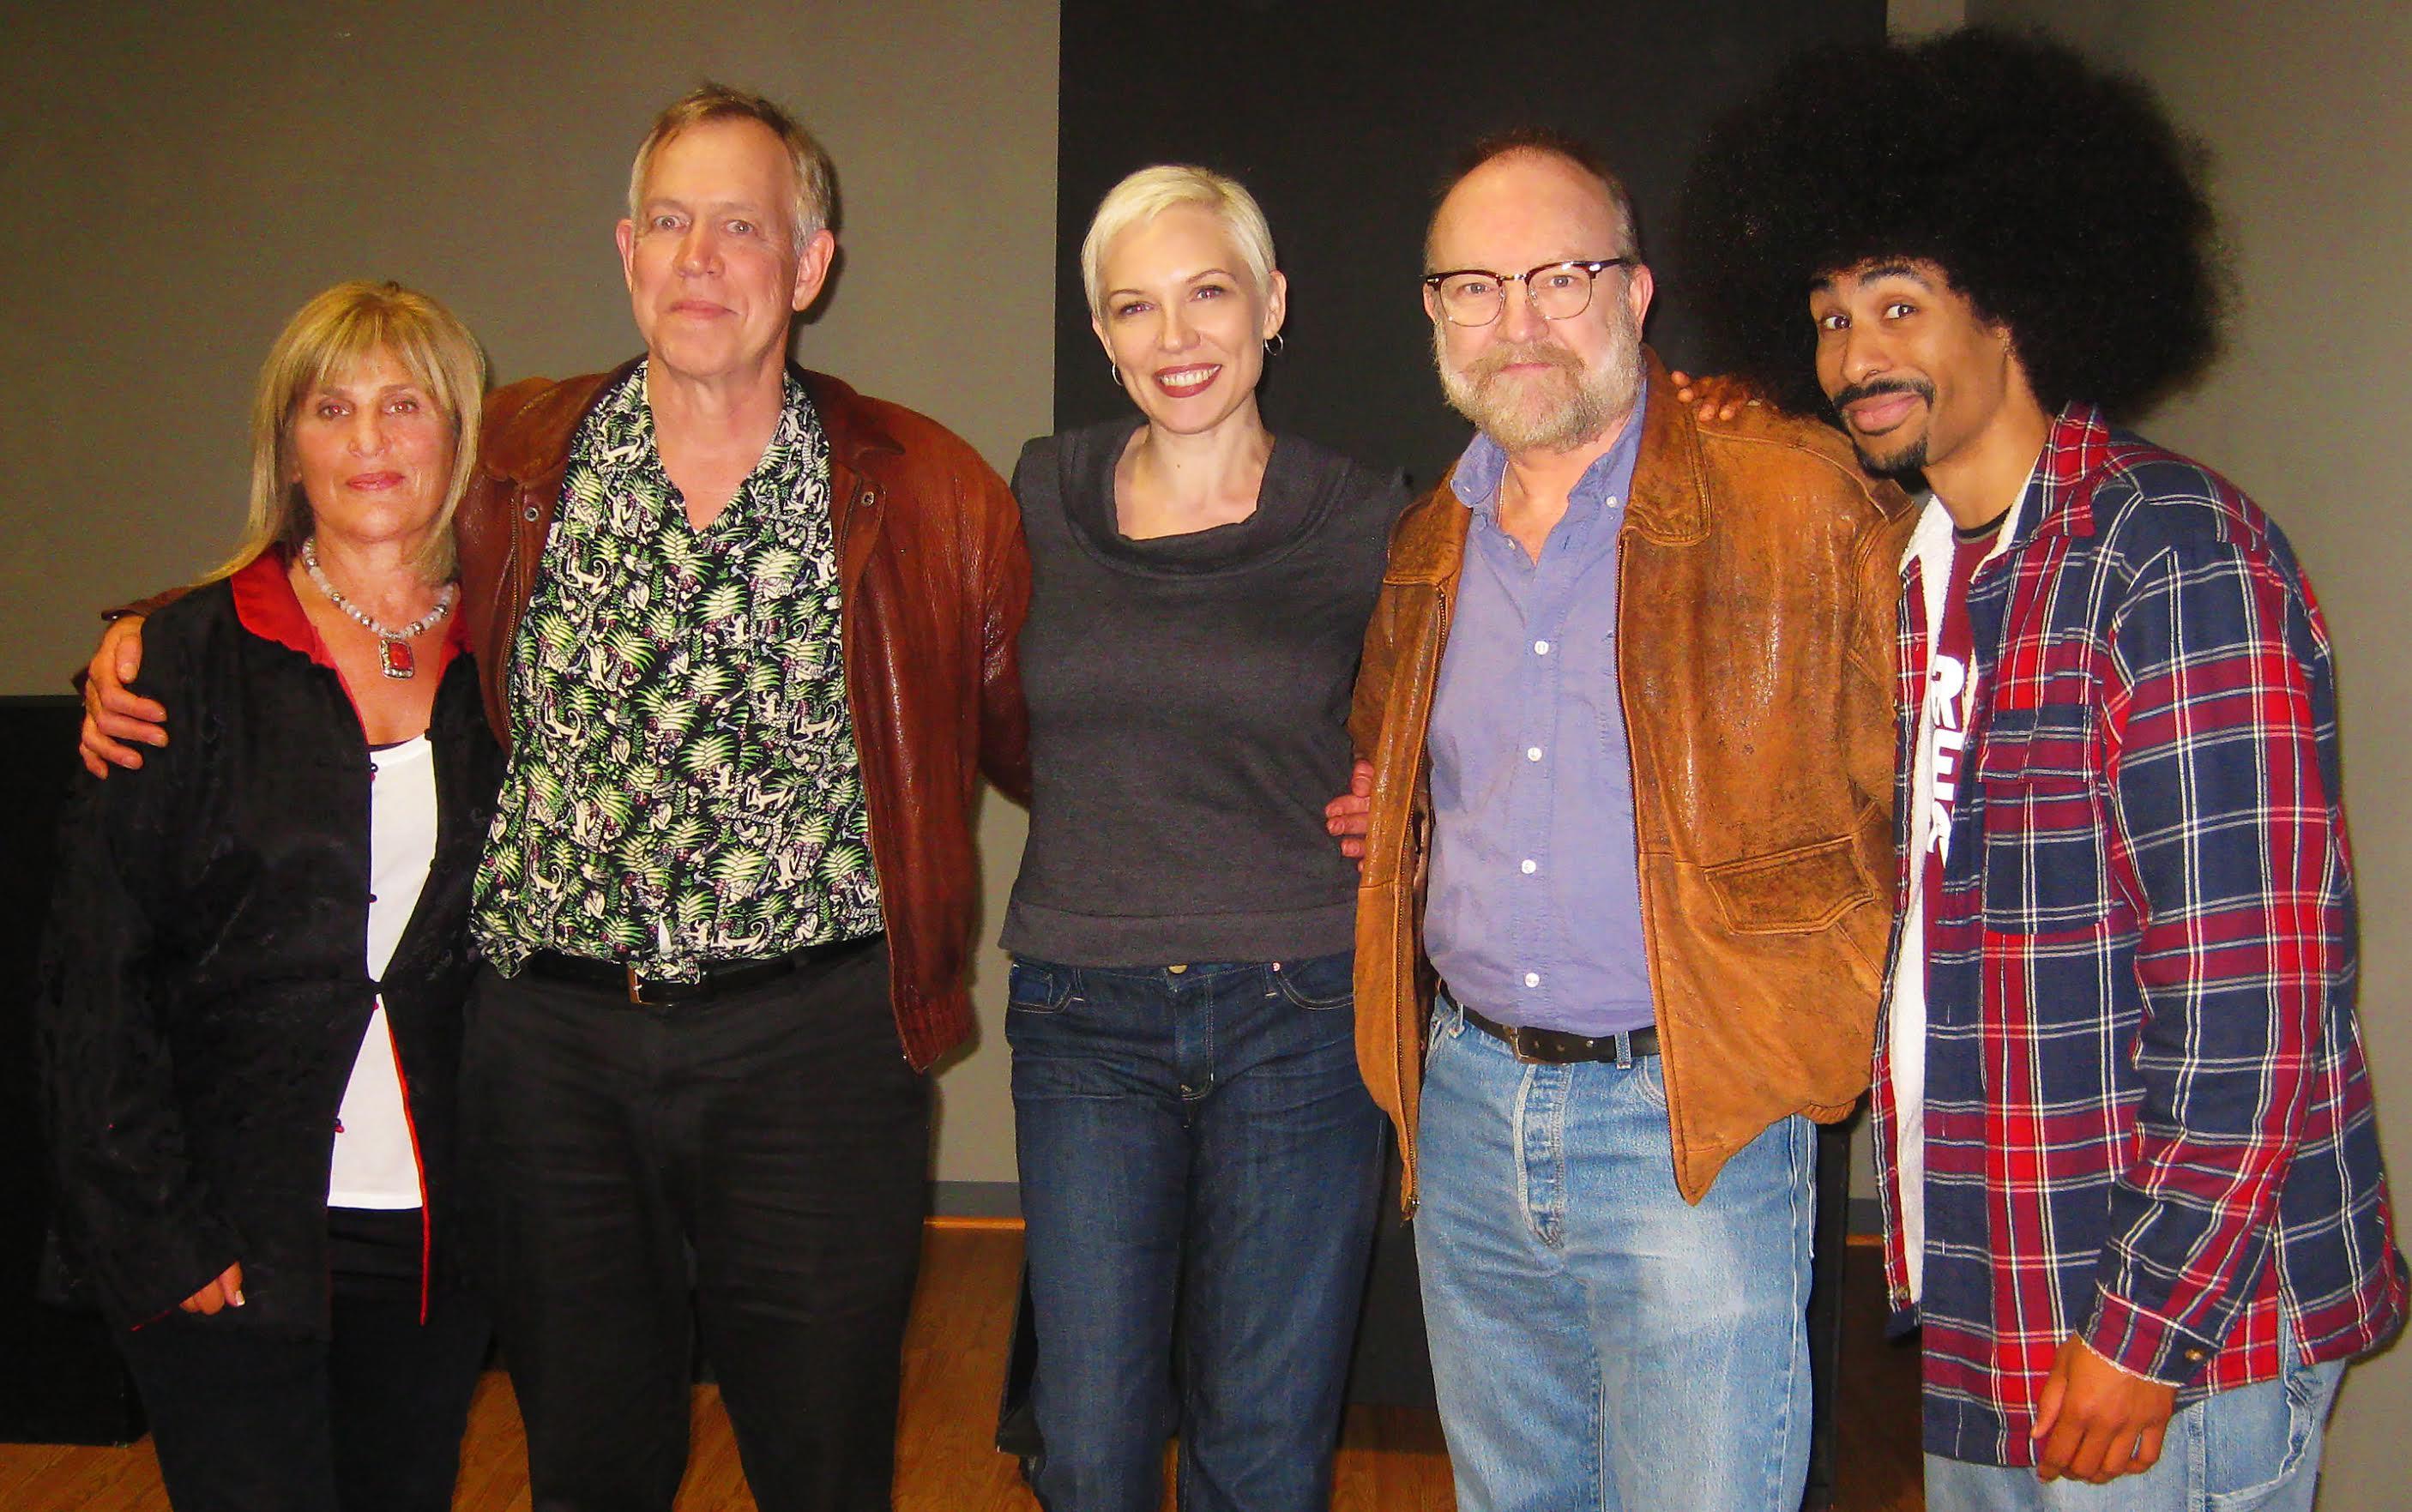 Spoken words performance - benefit to the Tsunami victim funds. Amy Friedman, David O'shea, Elaise Piper, Jim Beaver, Sean Hill